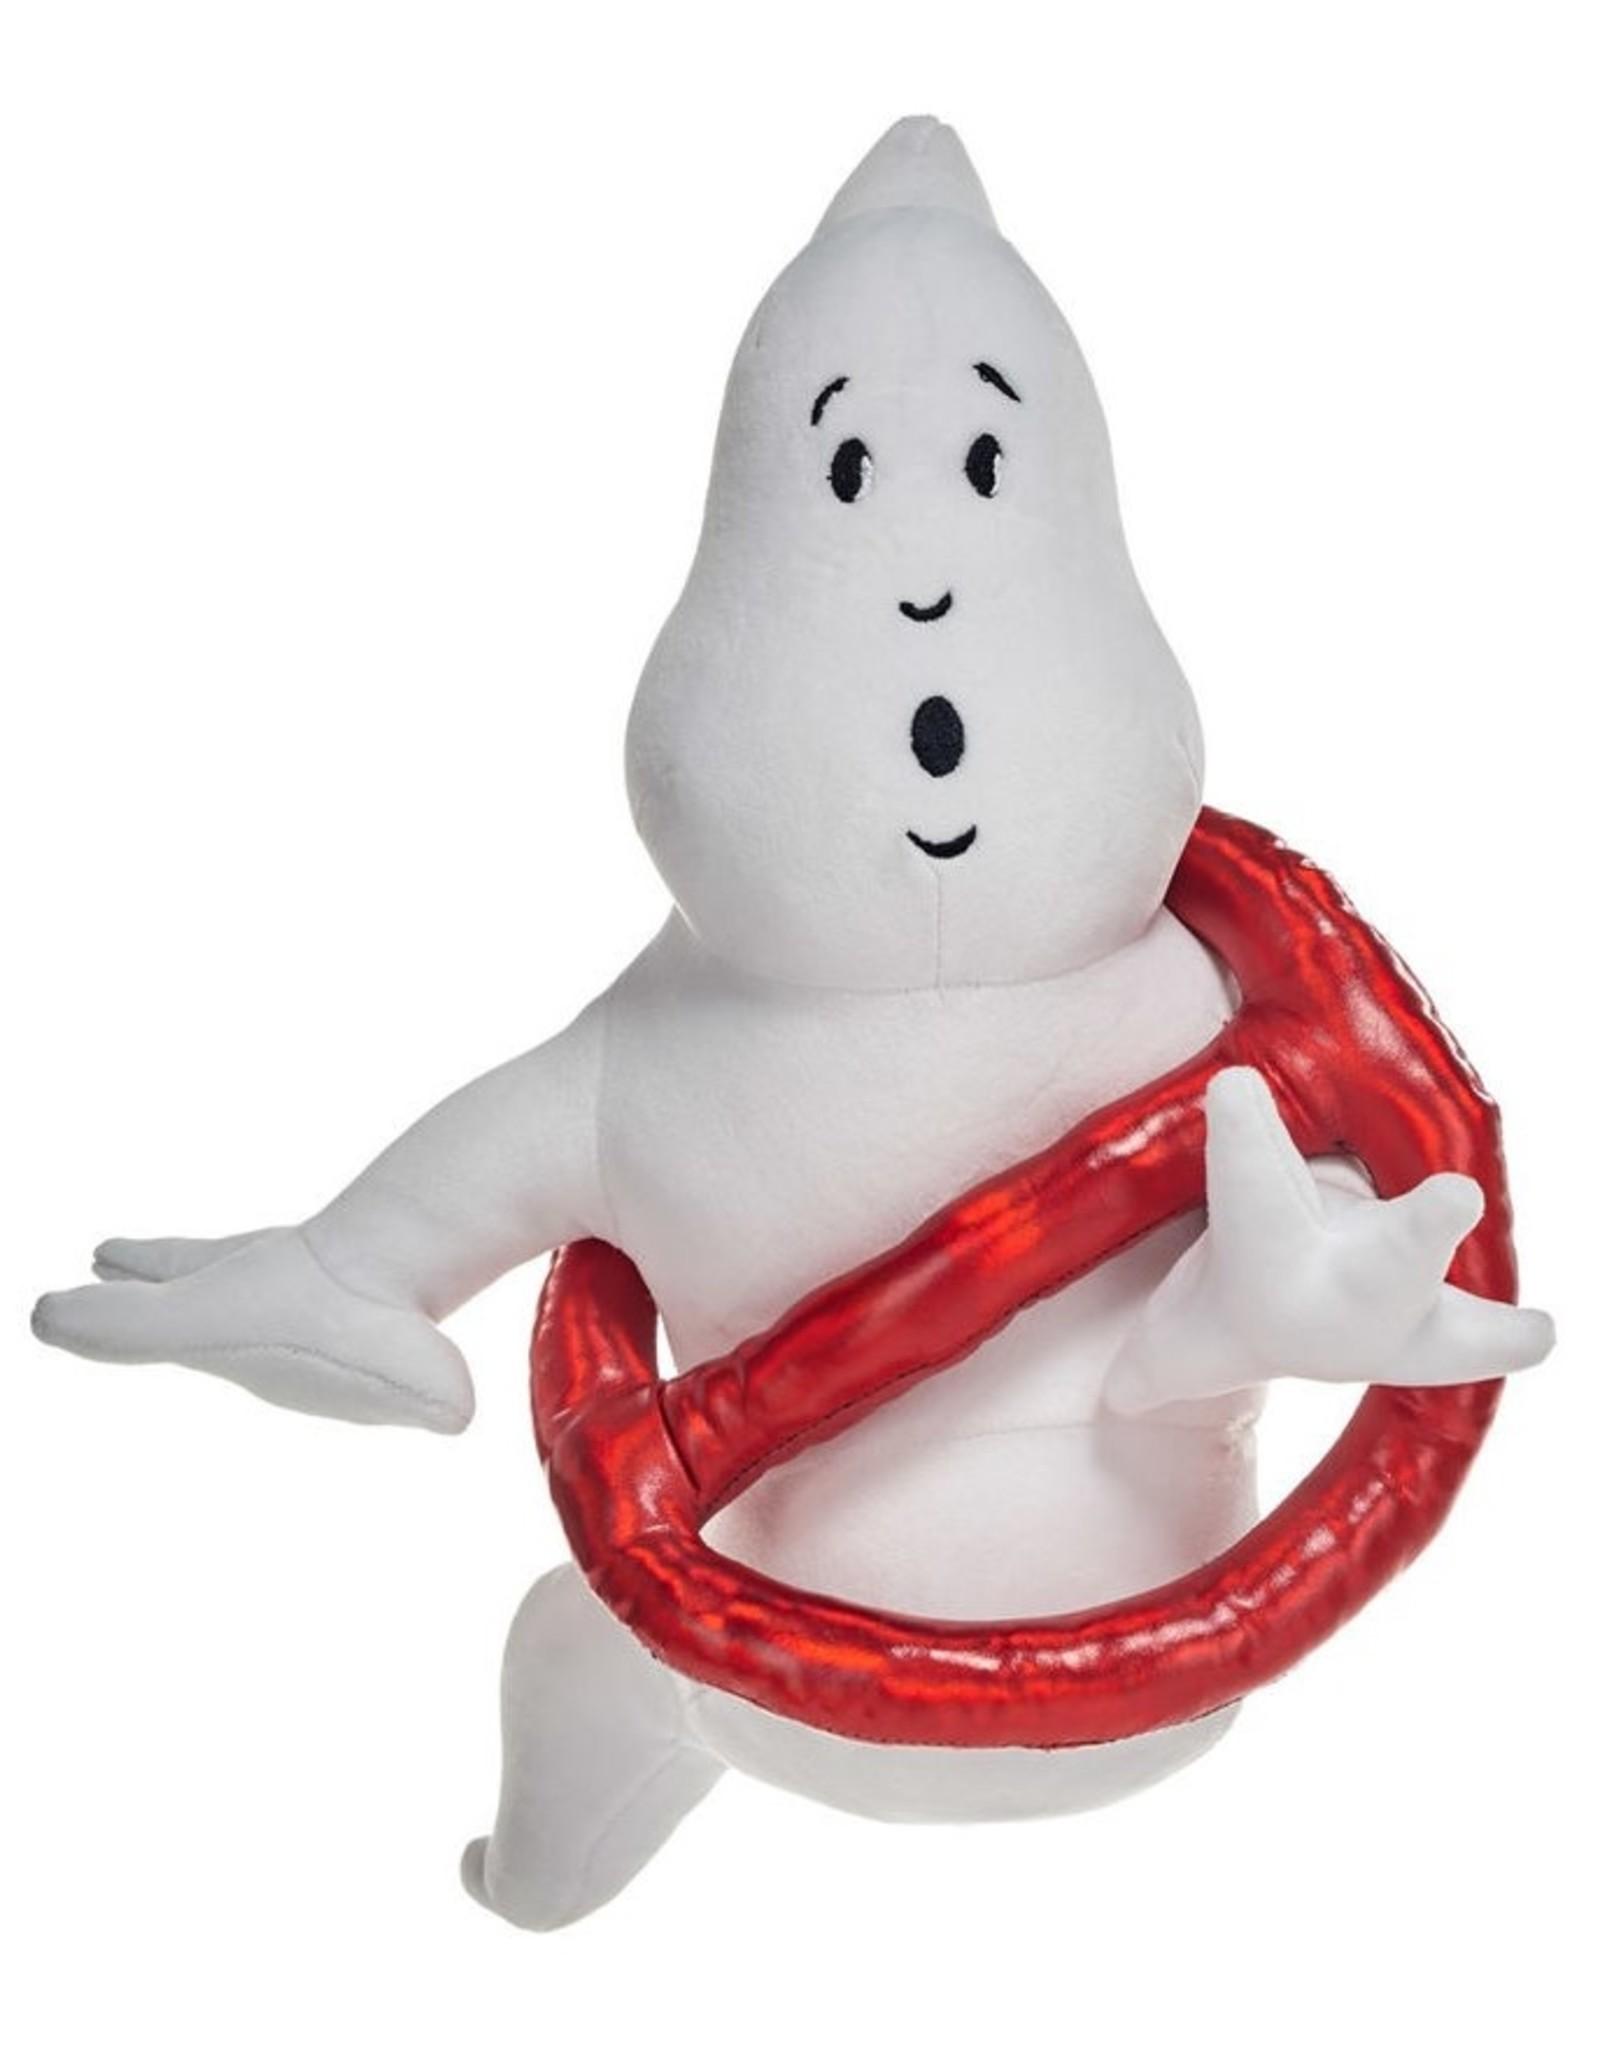 ghostbusters Merchandise pluche en figuren - Ghostbusters No Ghost pluche 32cm